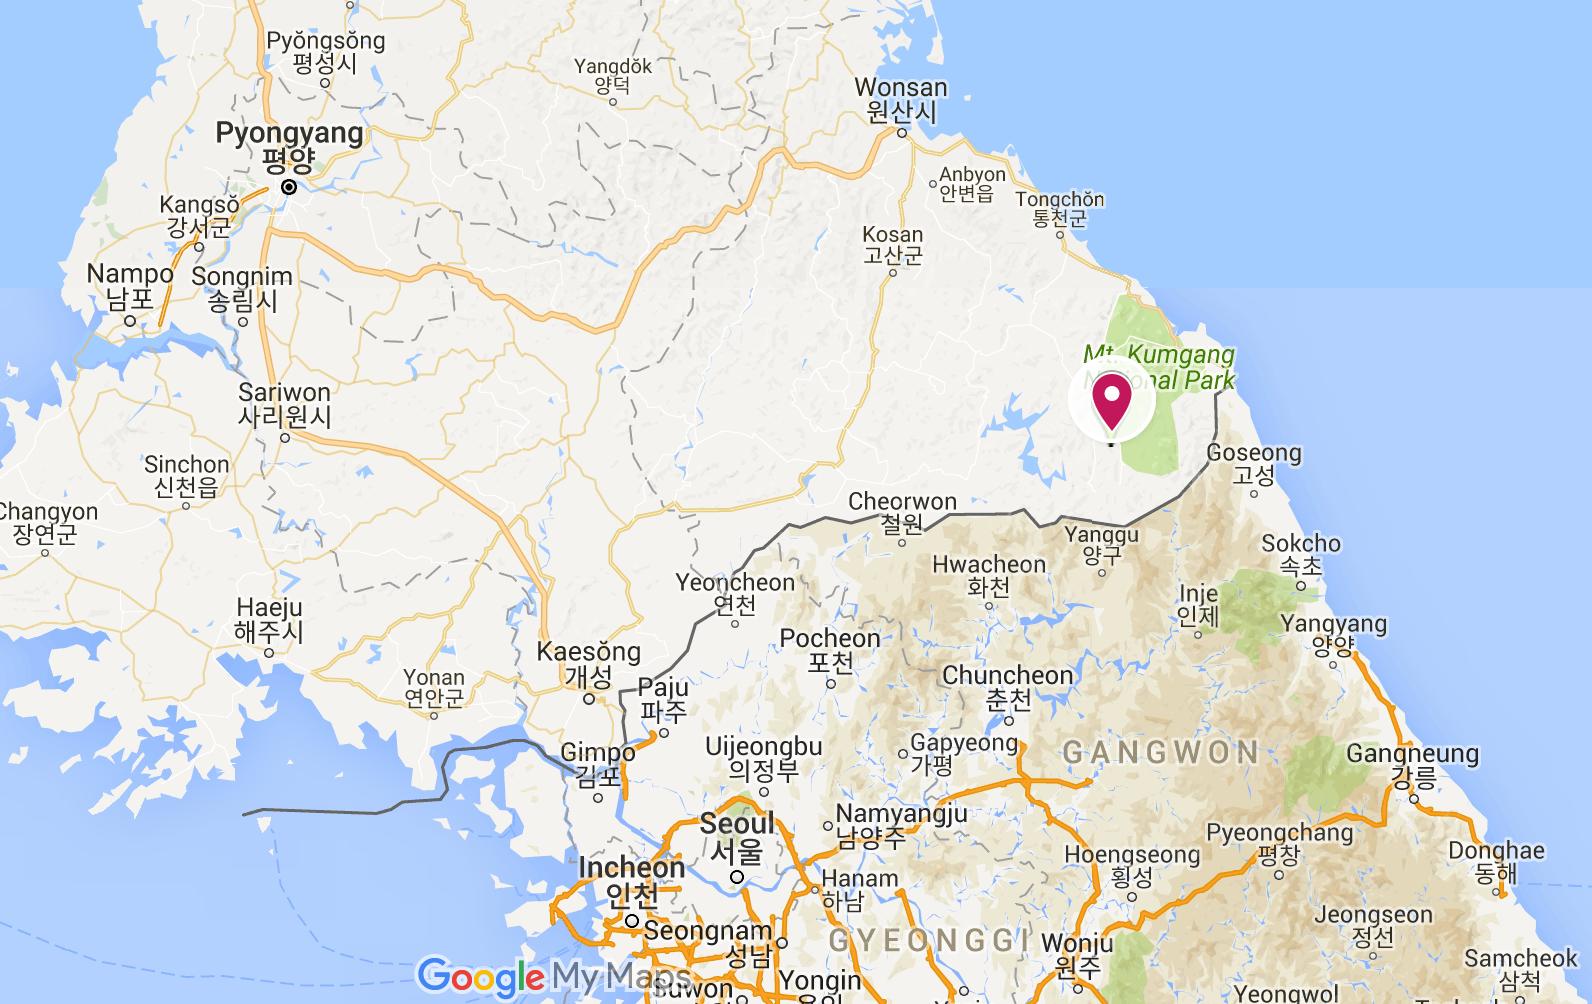 Mount Kumgang is to the south eastern of Pyongyang.